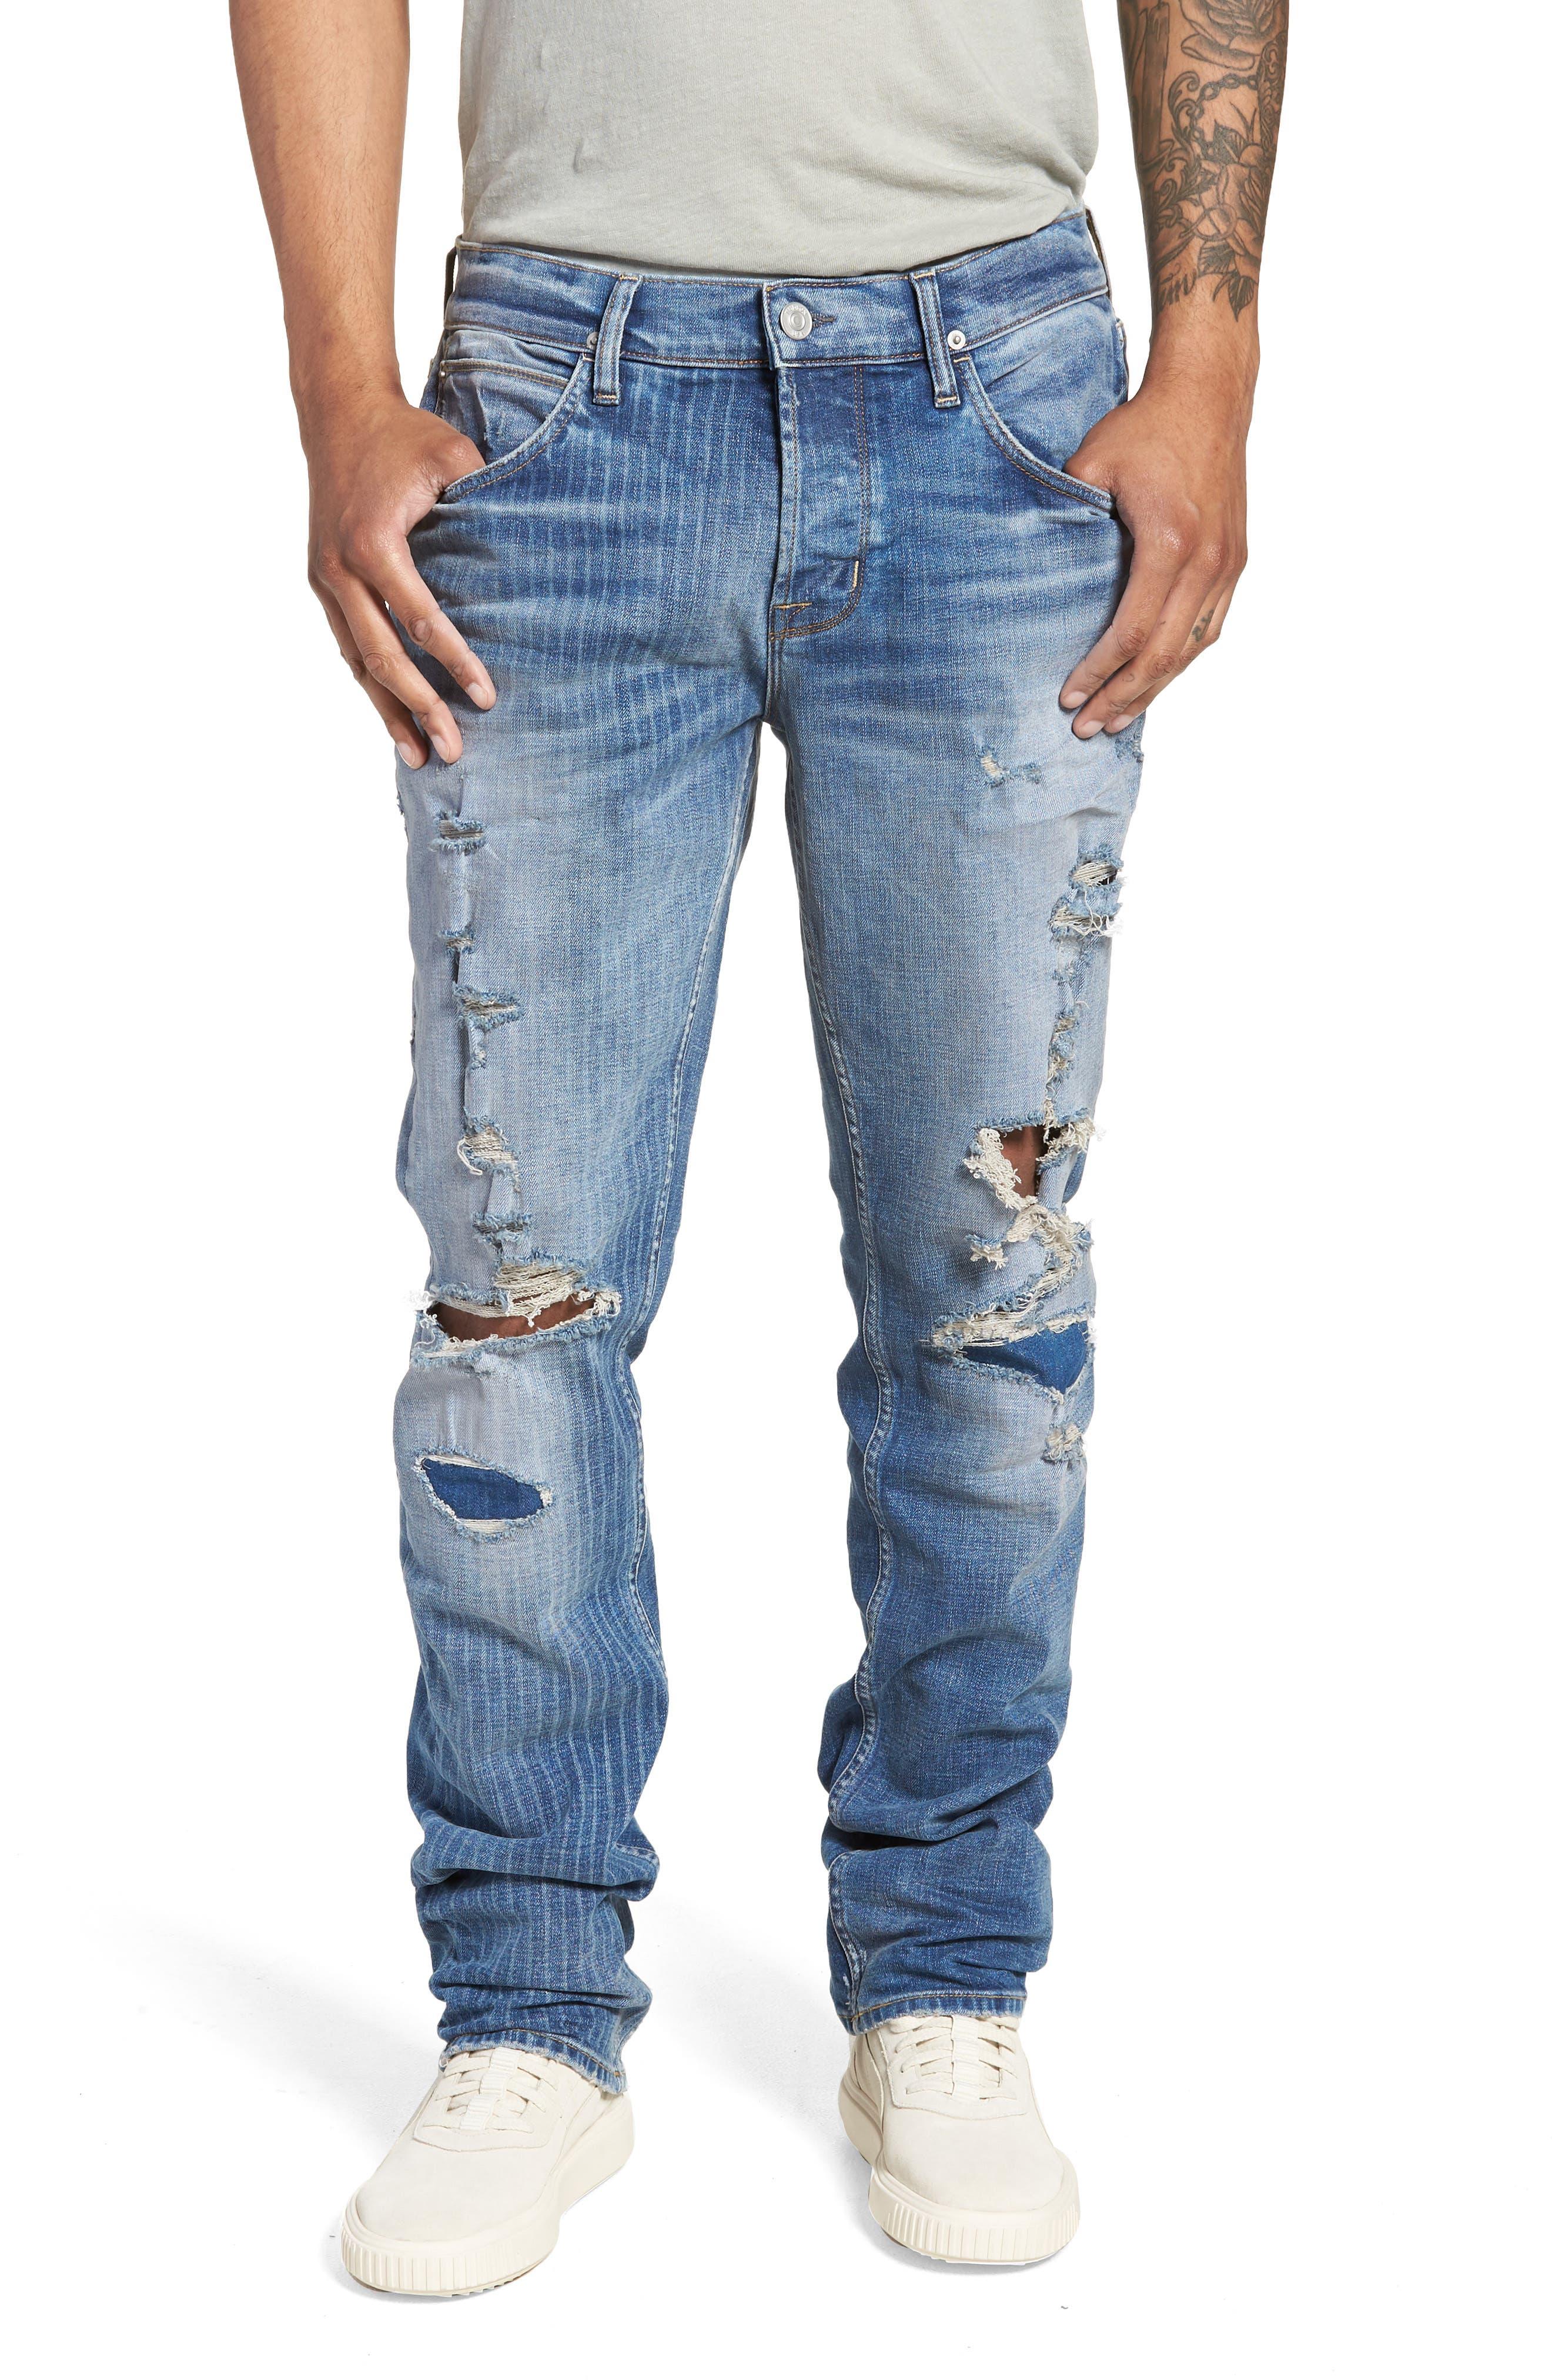 Blake Slim Fit Jeans,                             Main thumbnail 1, color,                             421